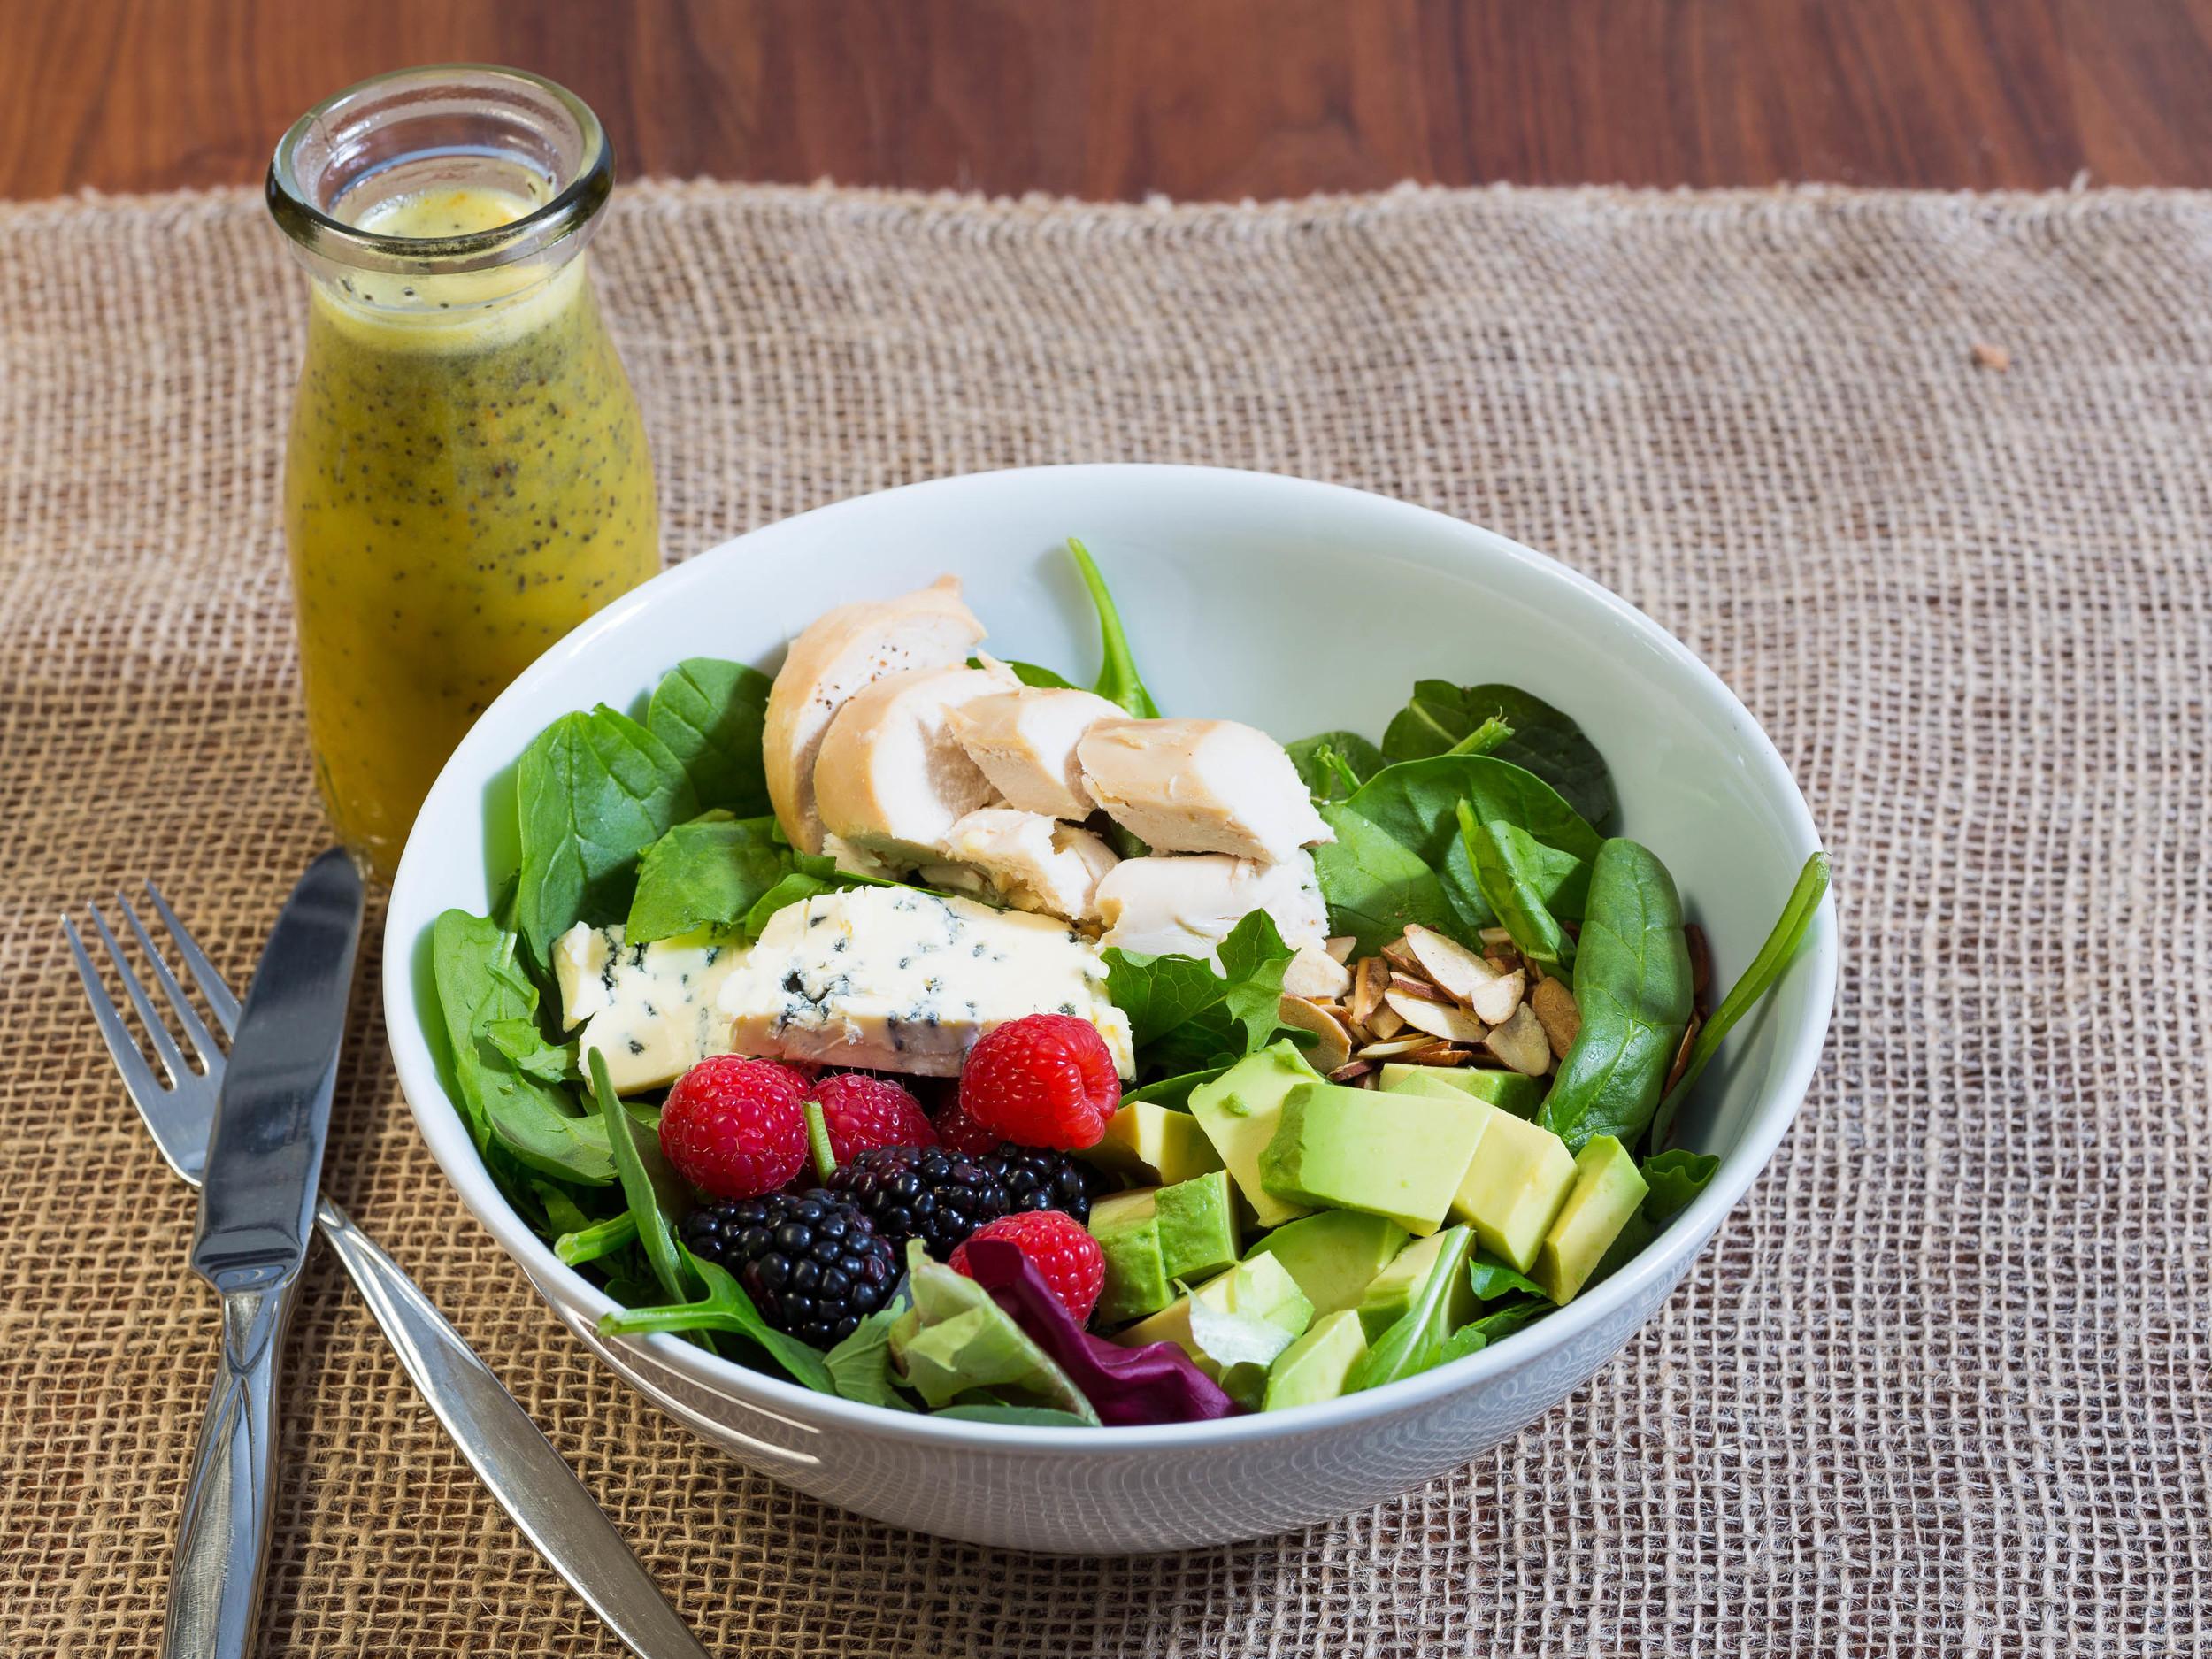 Salad with Orange and Poppyseed Dressing